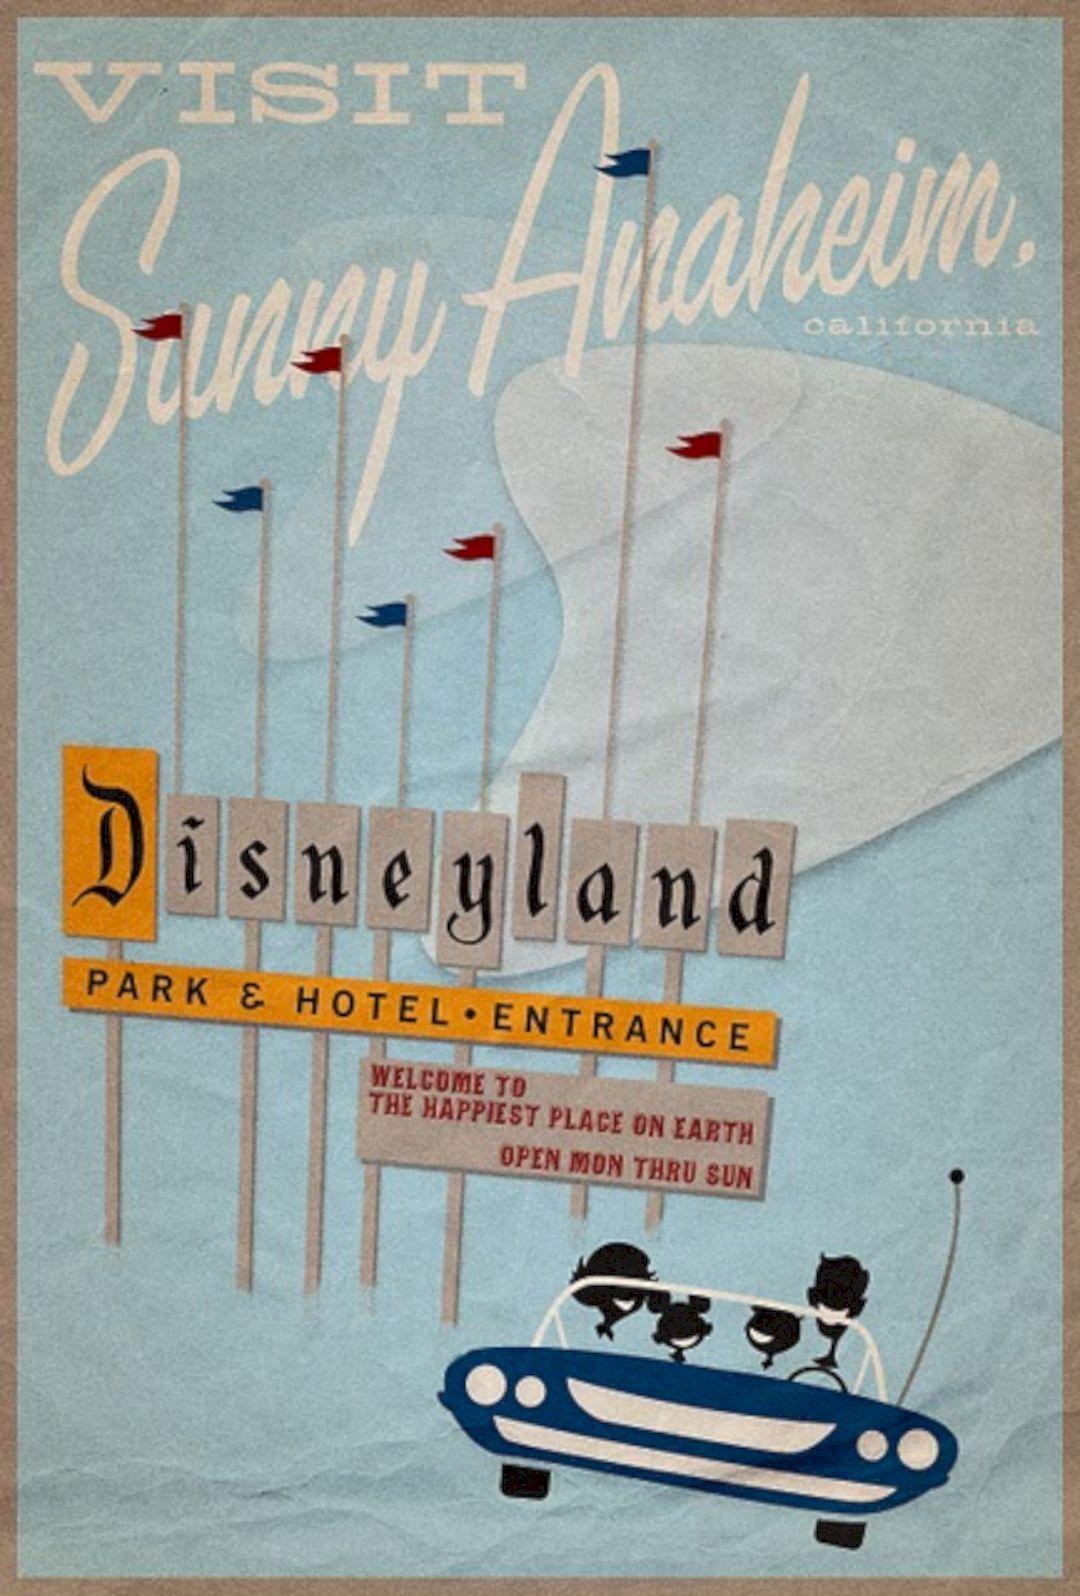 Lofree Four Seasons A Mechanical Keyboard With Colorful Retro Design Disney Posters Vintage Disneyland Retro Disney